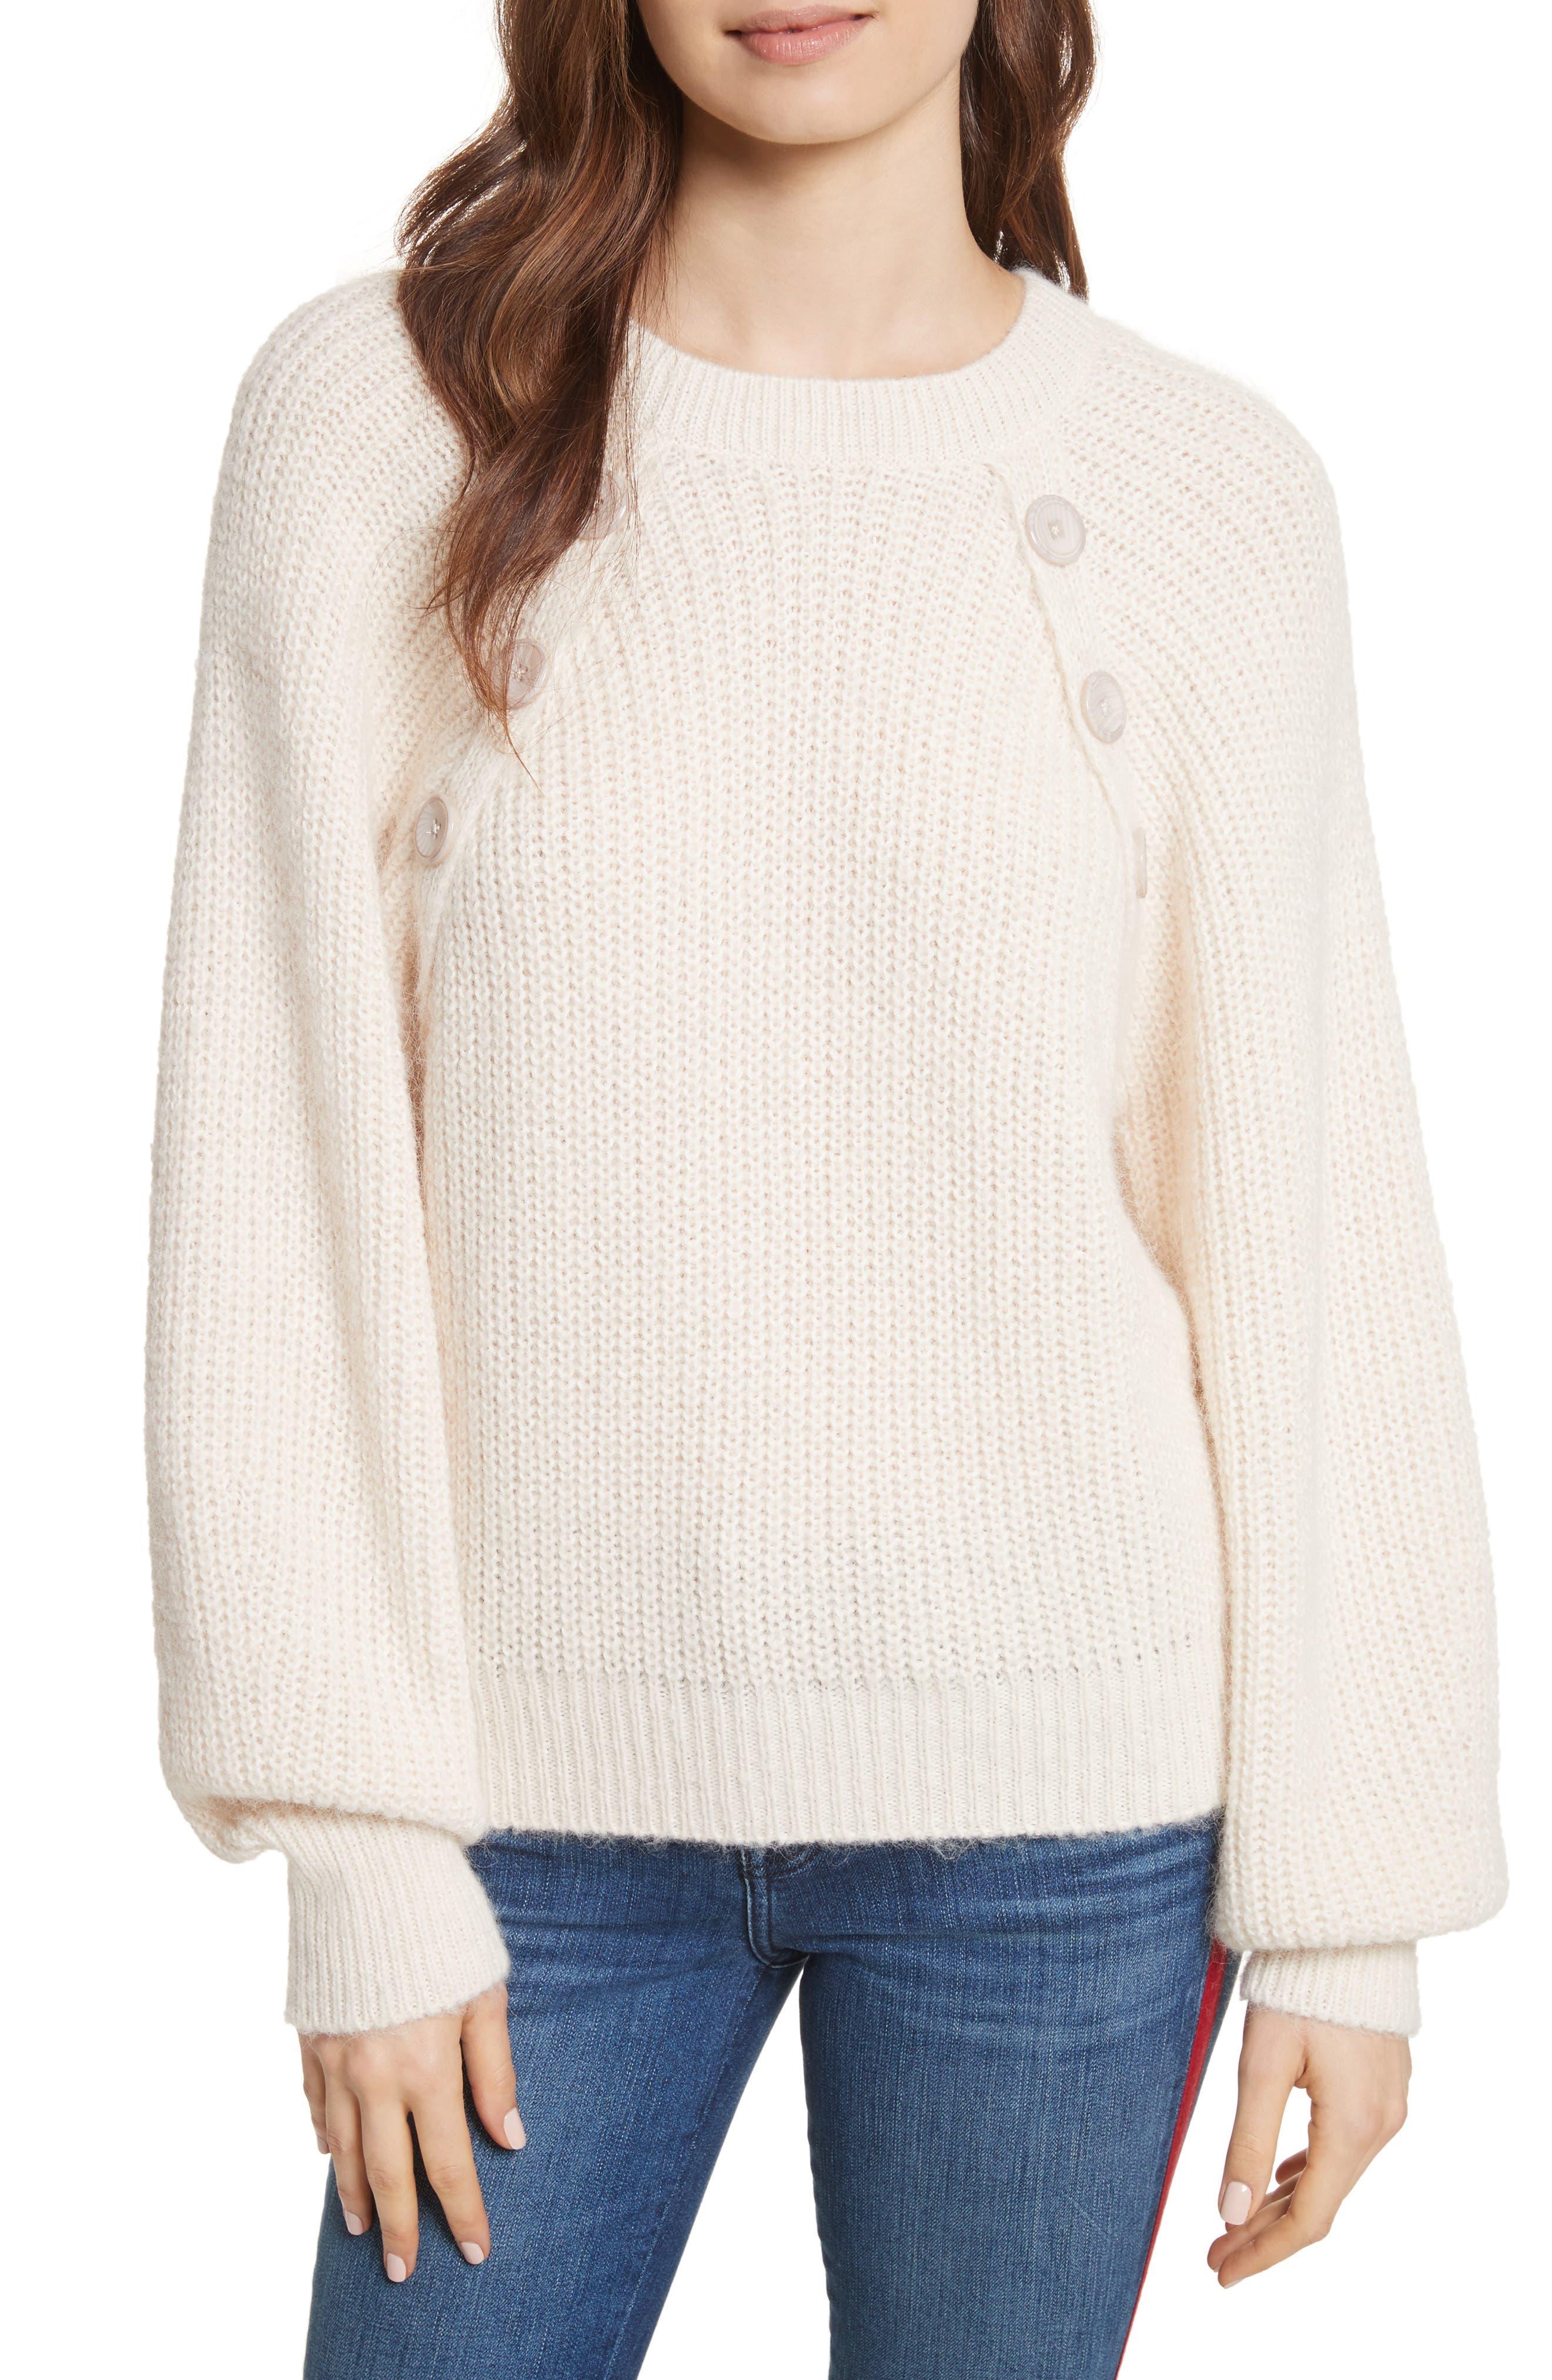 Aine Sweater,                         Main,                         color, Porcelain